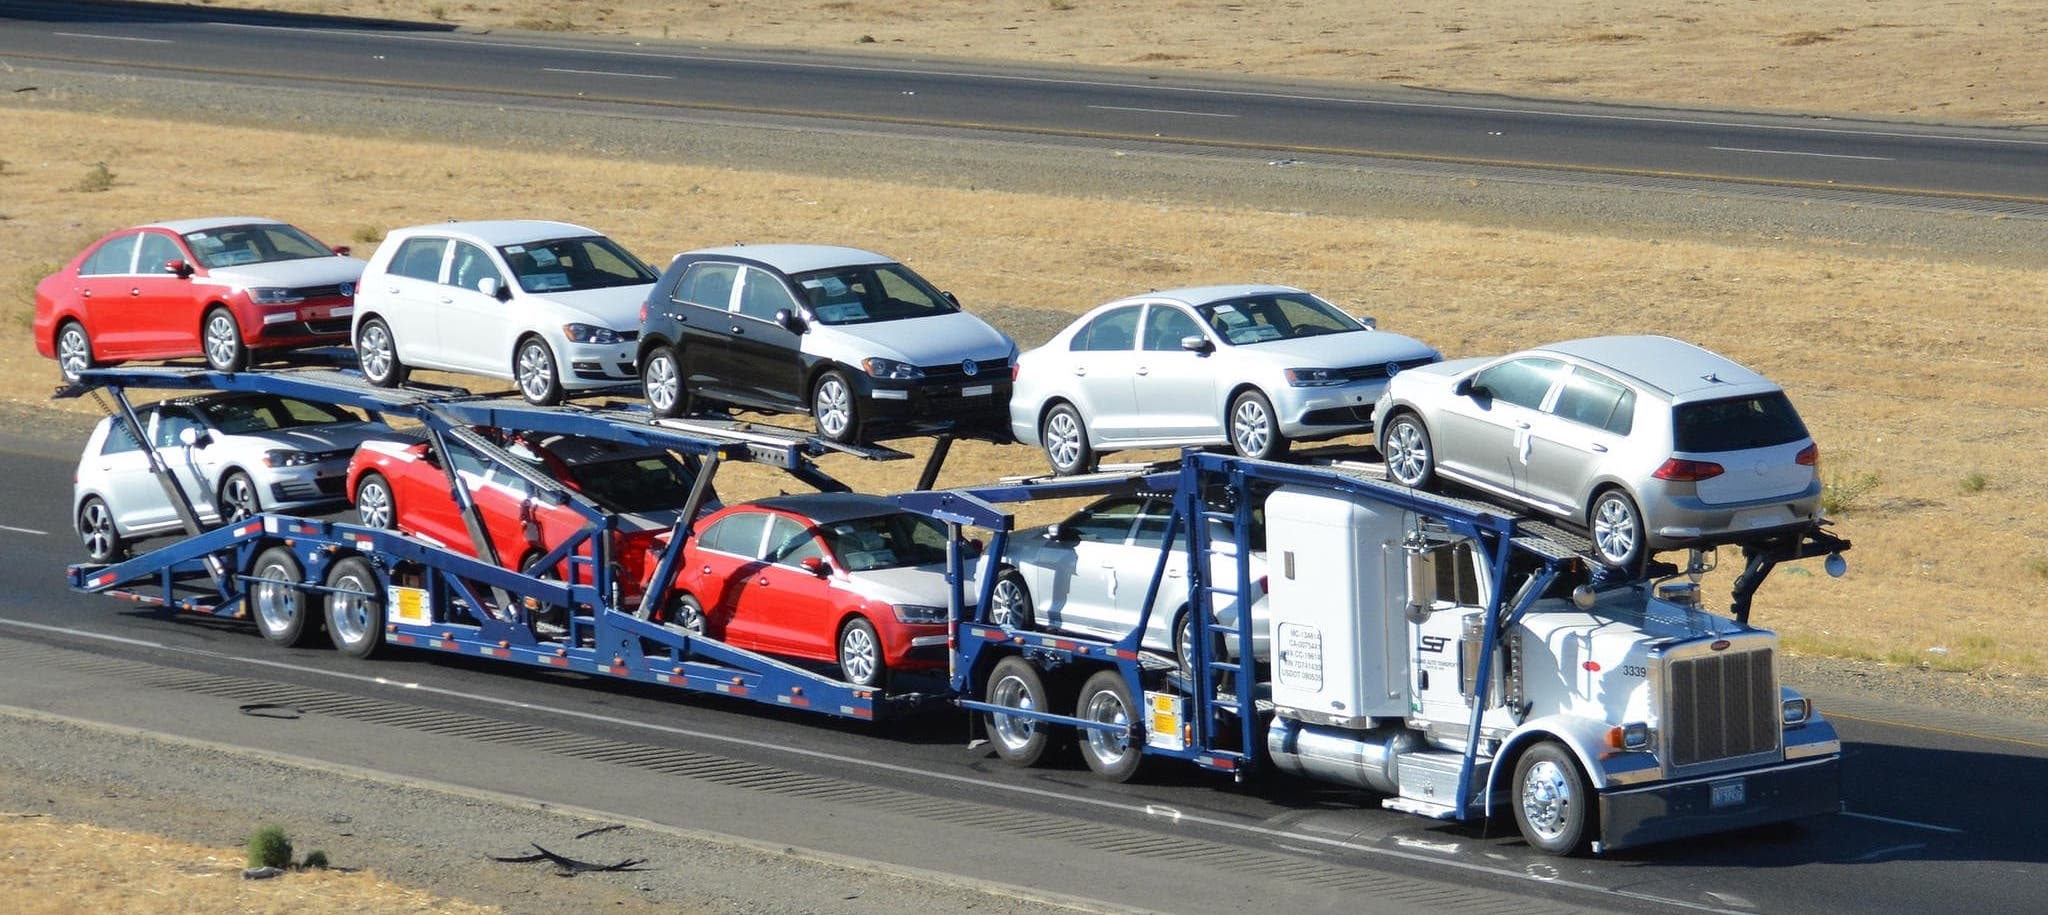 Open Auto Transport - Car Shipping by www.alldayautotransport.com